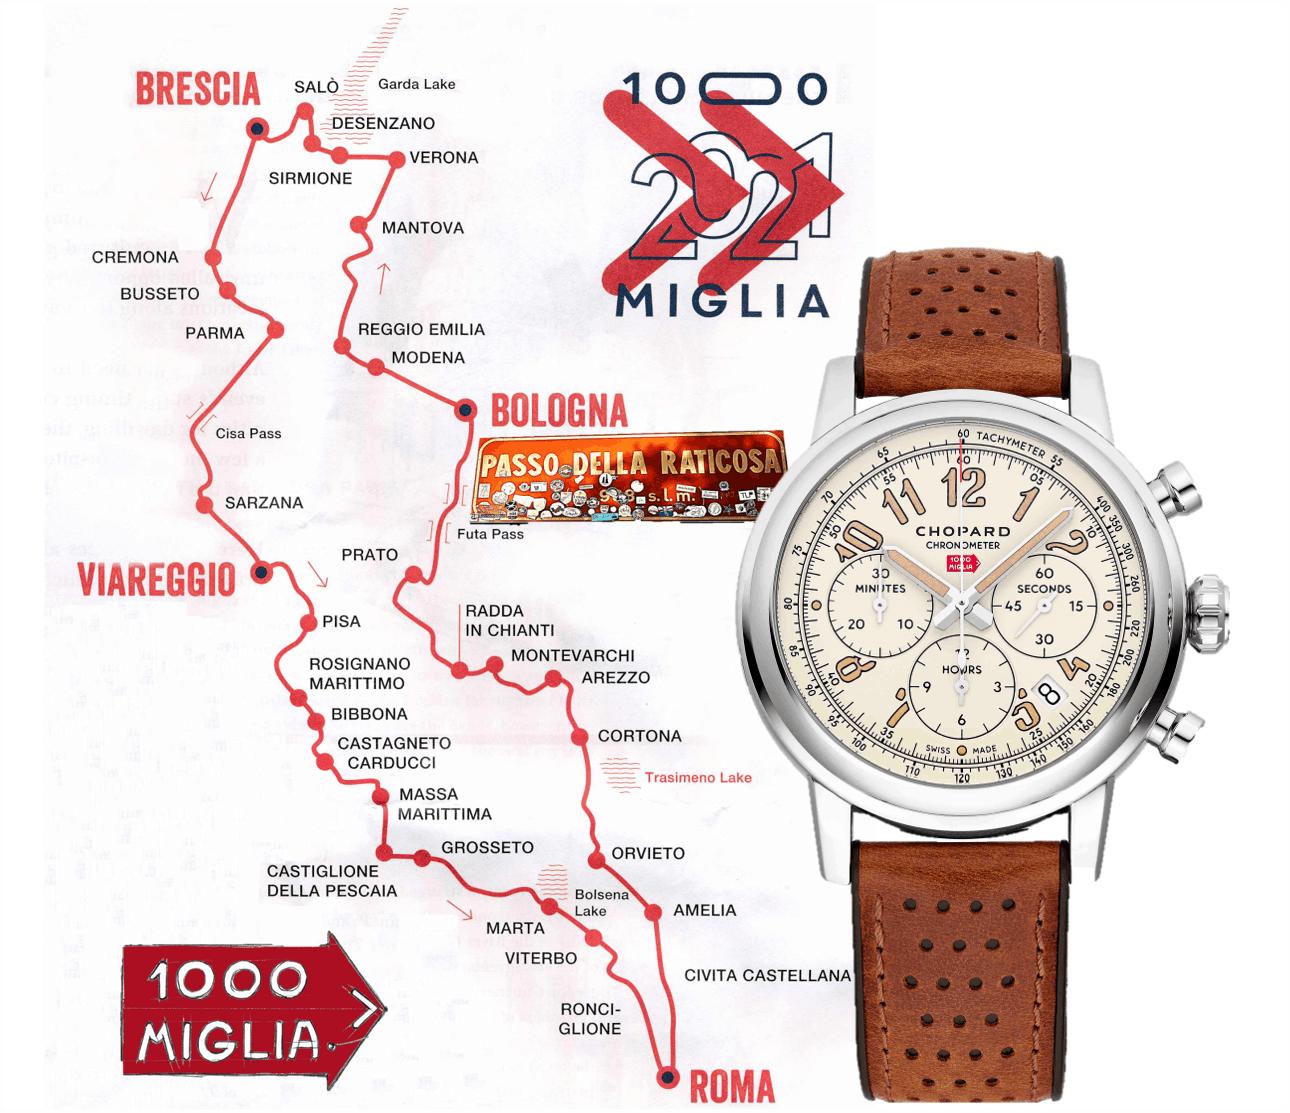 Landkarte der Mille Miglia 2021 und der Chopard Mille Miglia Classic Chronograph Raticosa